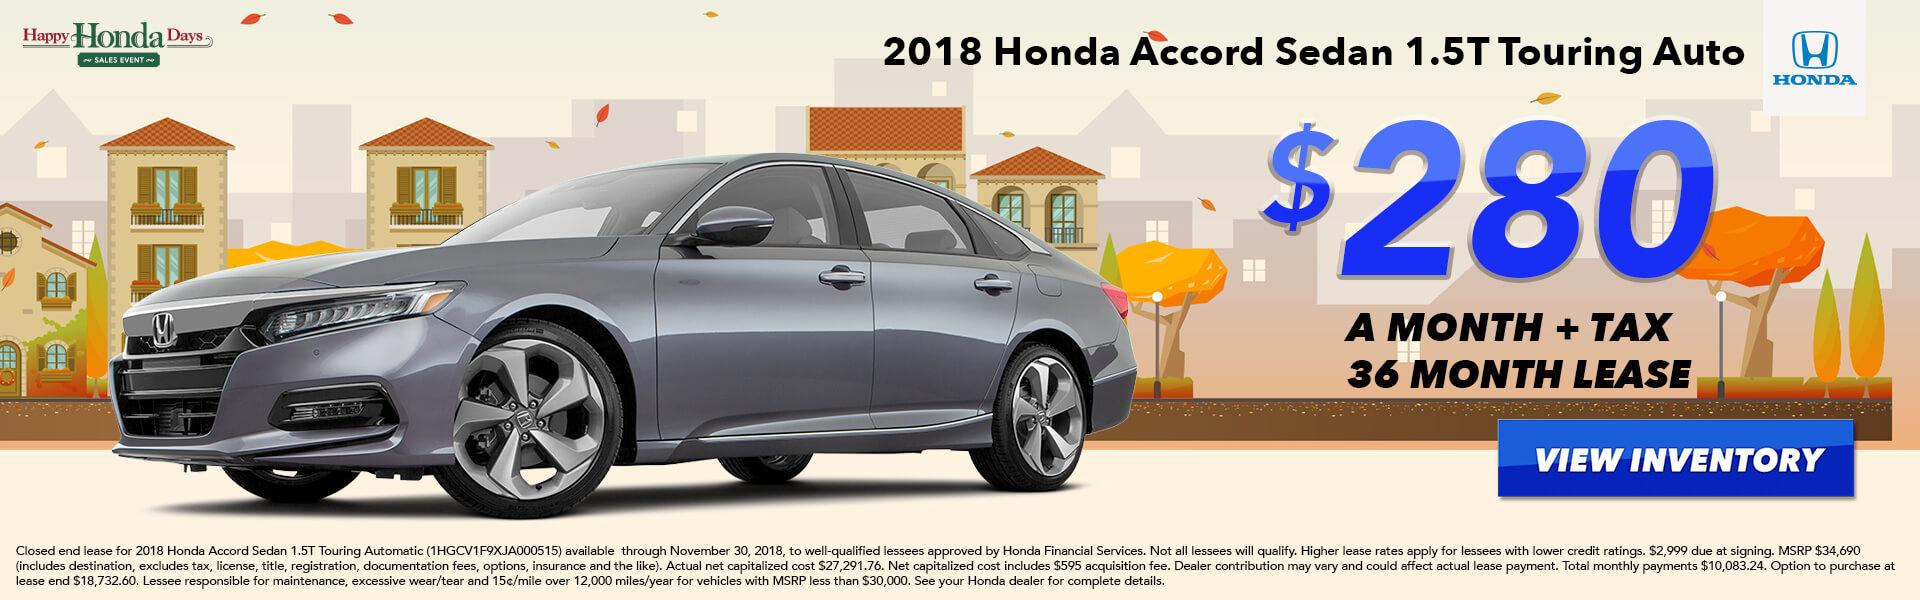 Accord Sedan Lease $280